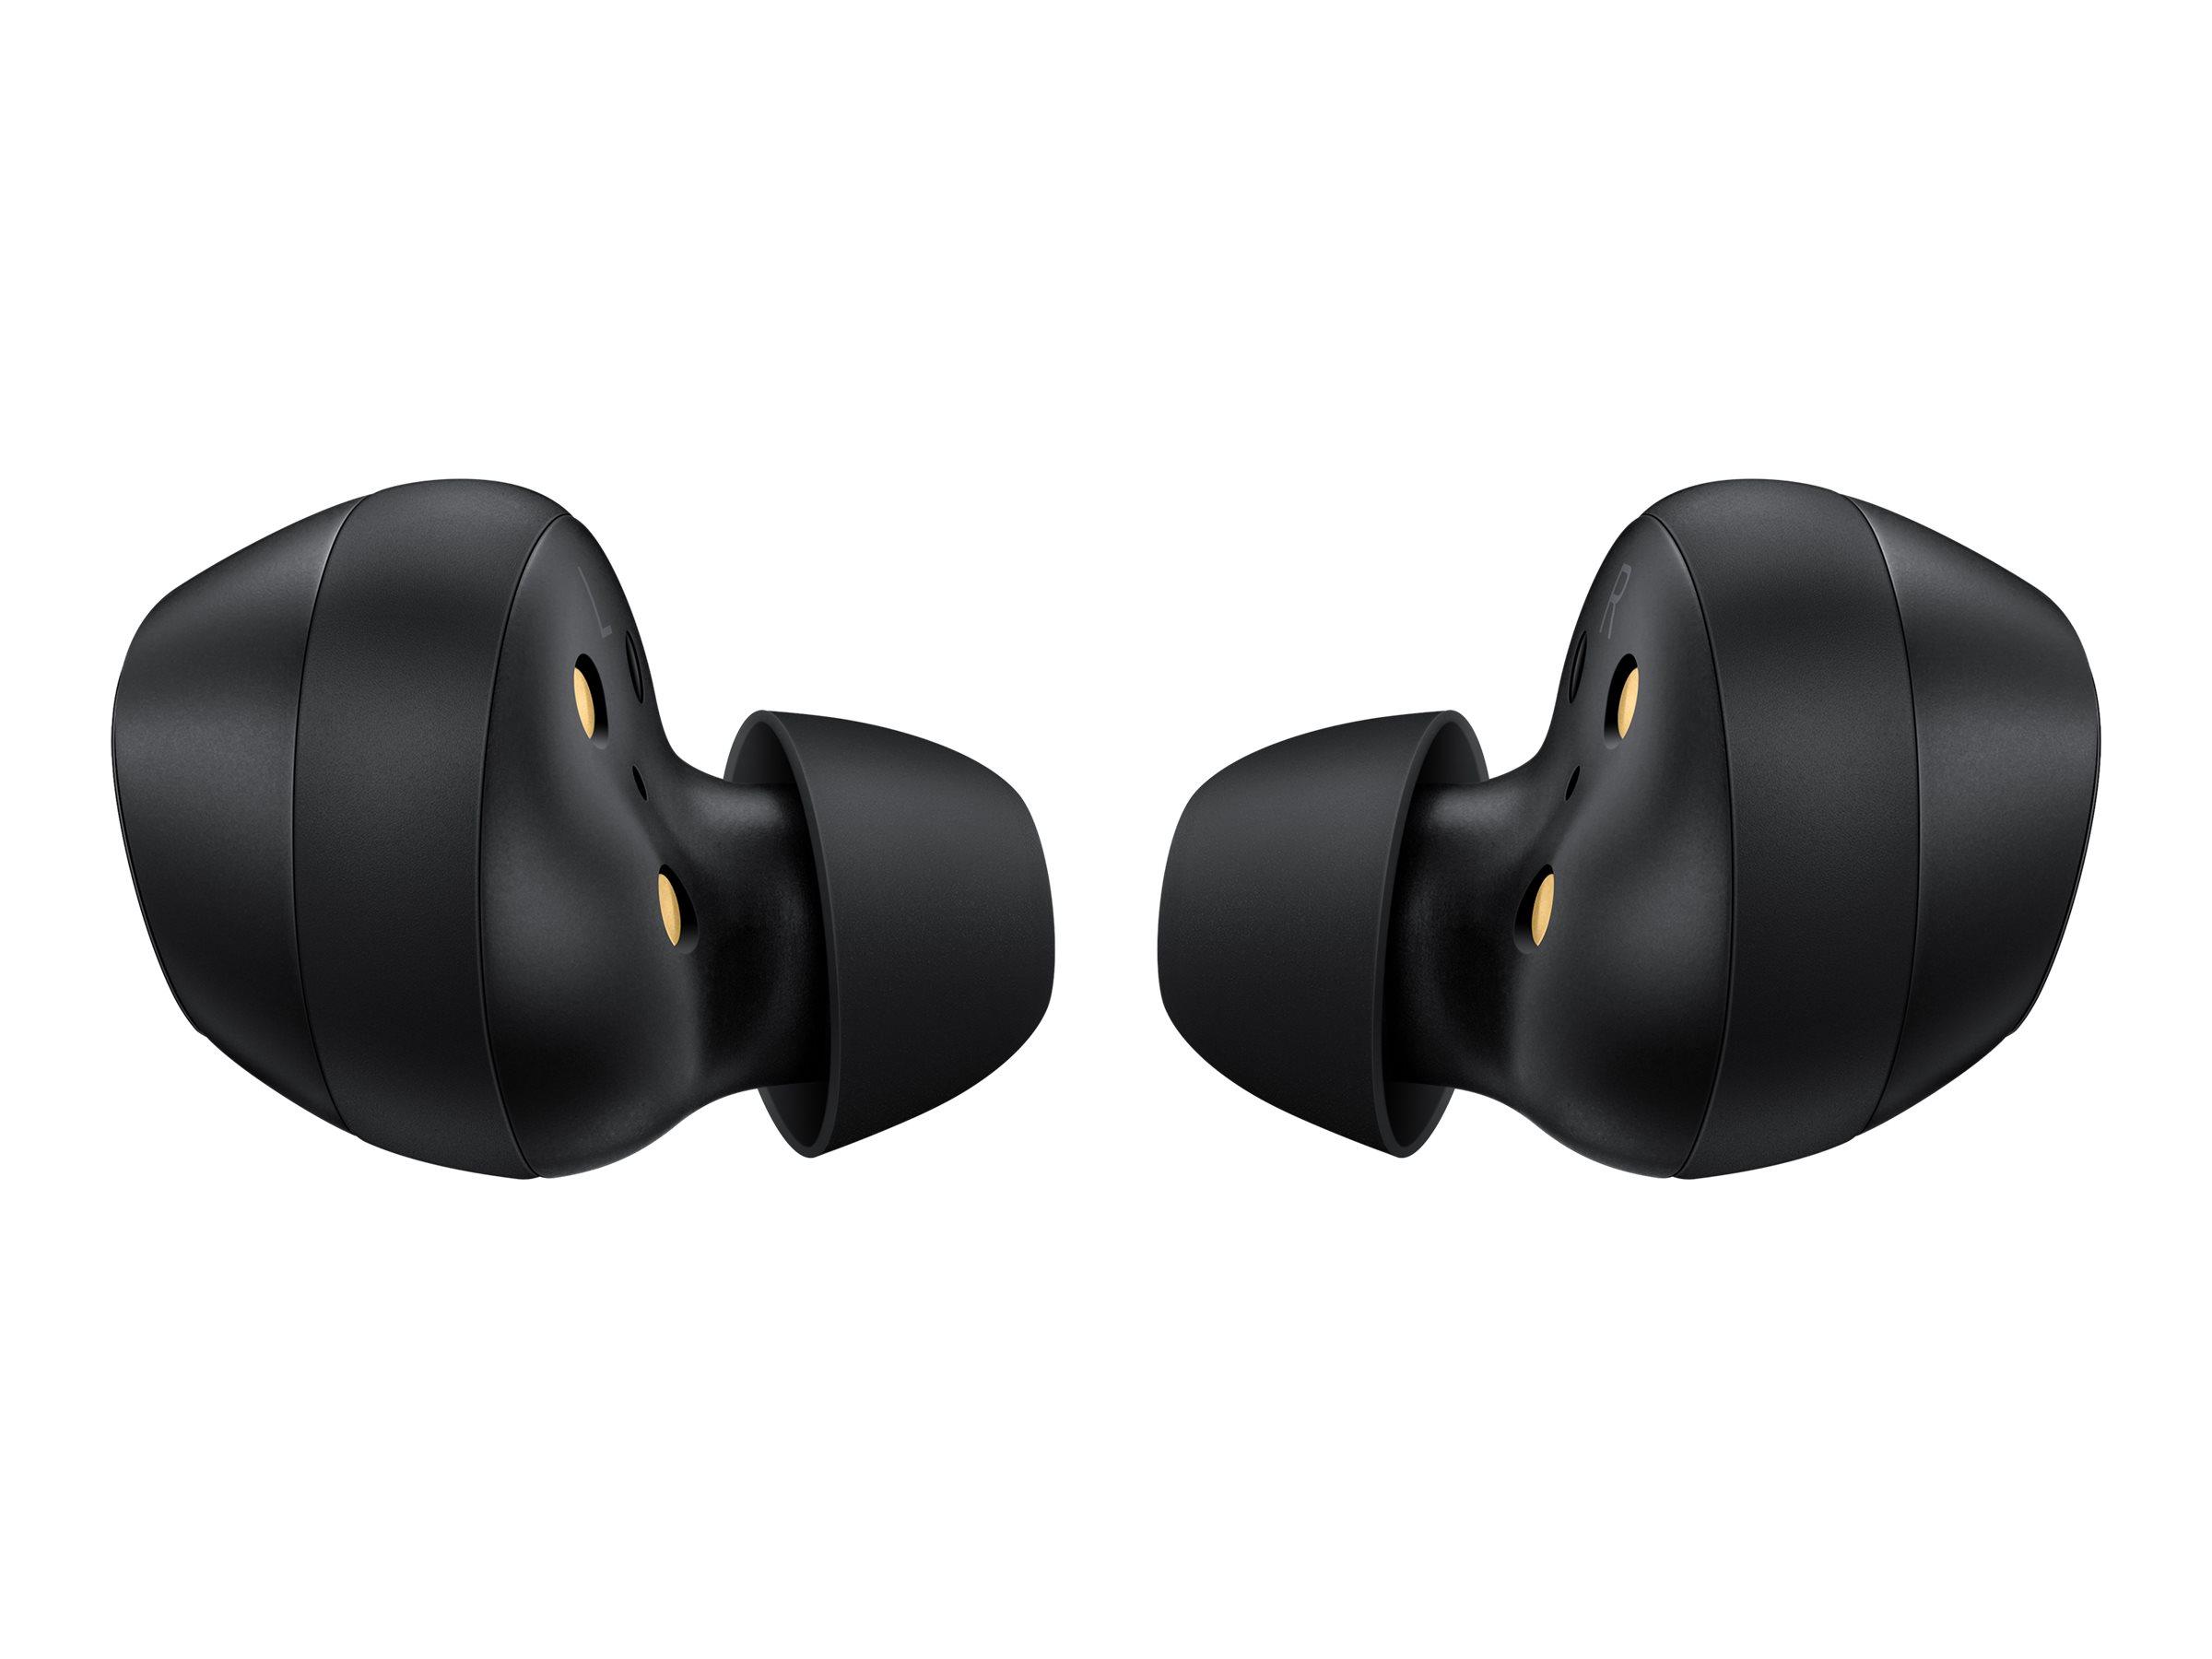 Samsung Galaxy Buds - True Wireless-Kopfh?rer mit Mikrofon